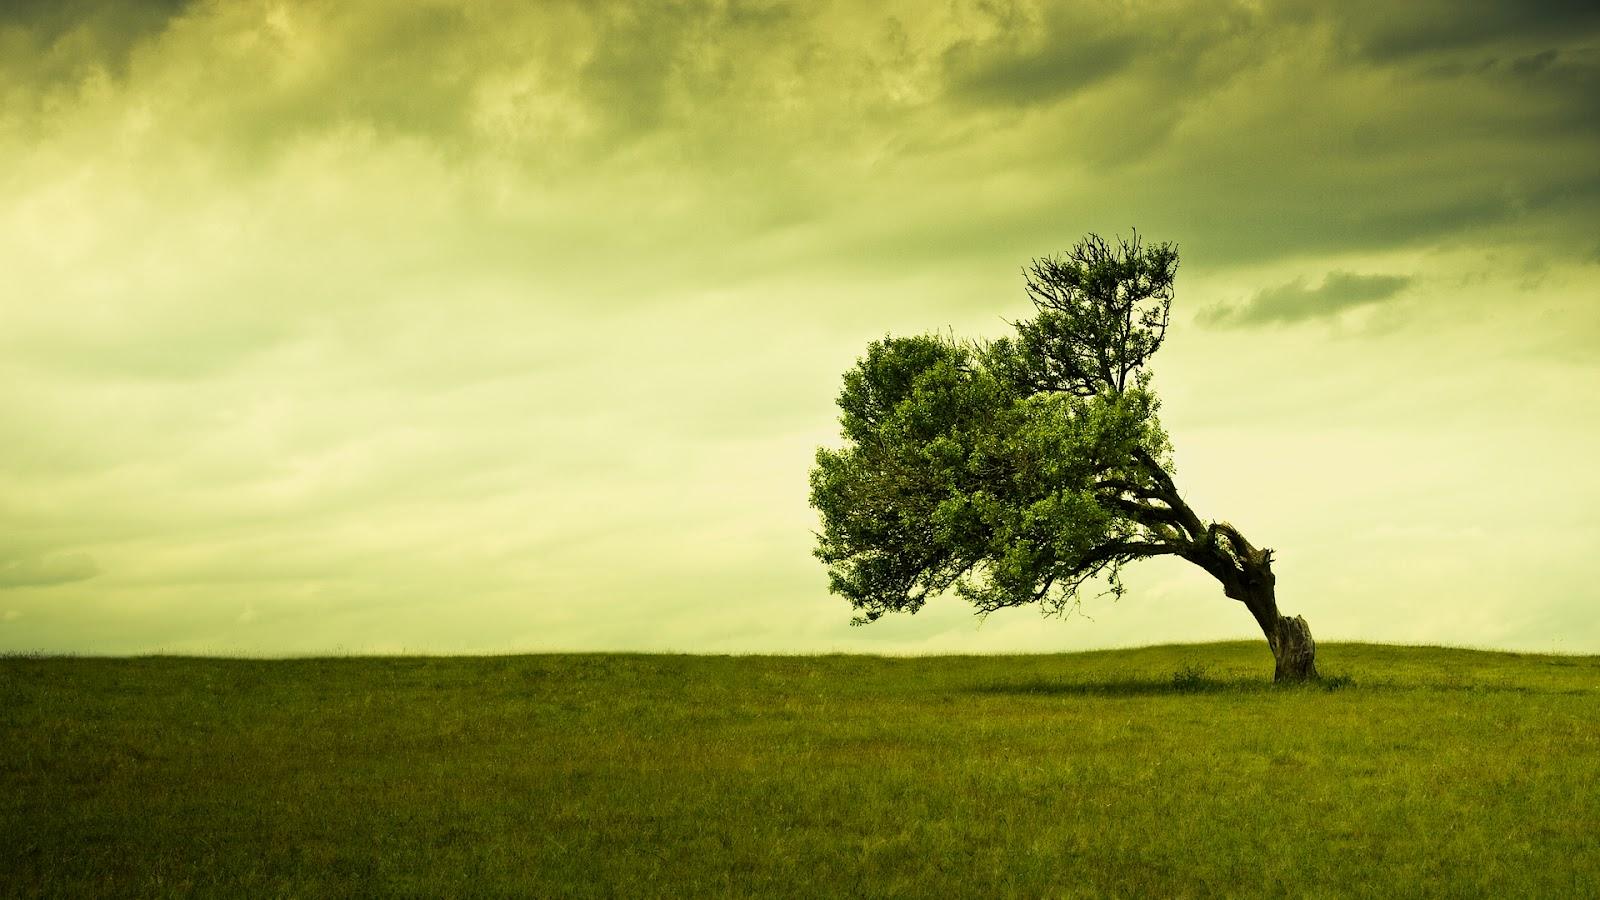 Sweetcouple hd tree background wallpapers free green - Green nature wallpaper full hd ...